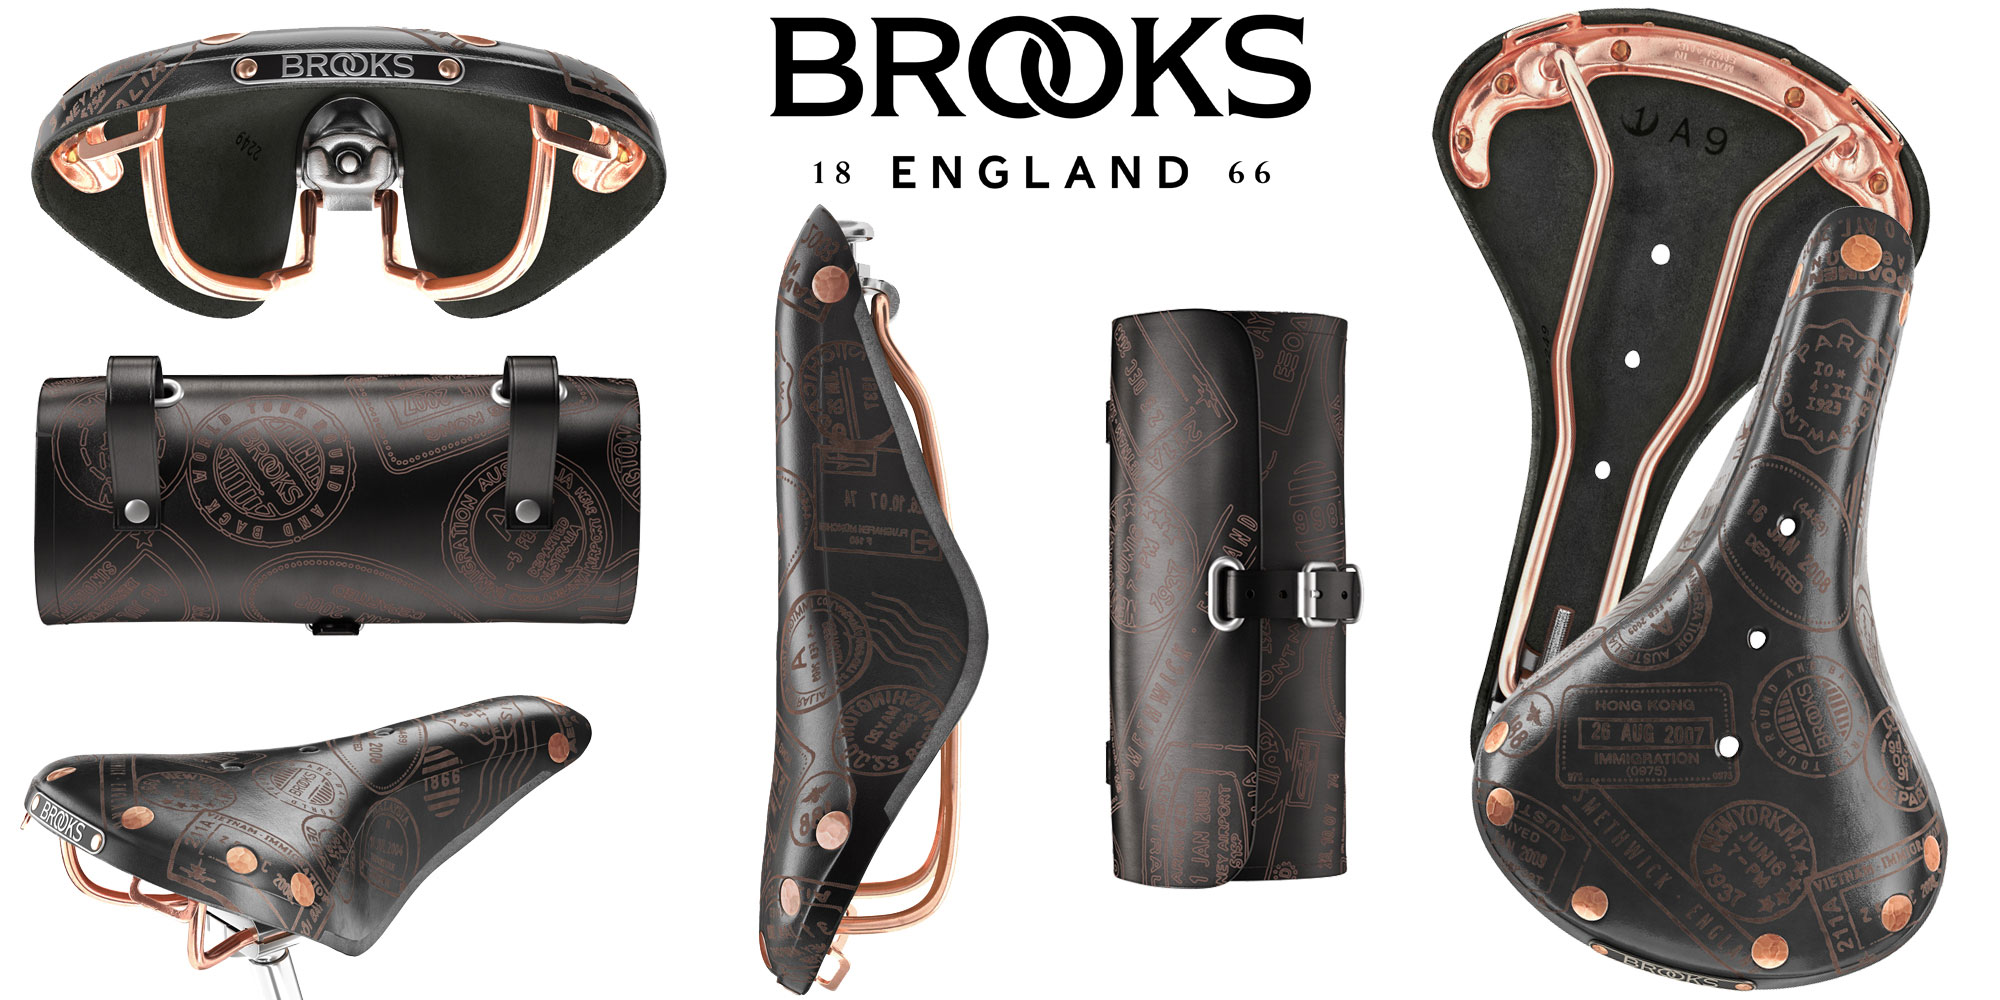 press-release-banner-brooks-LAB3.jpg